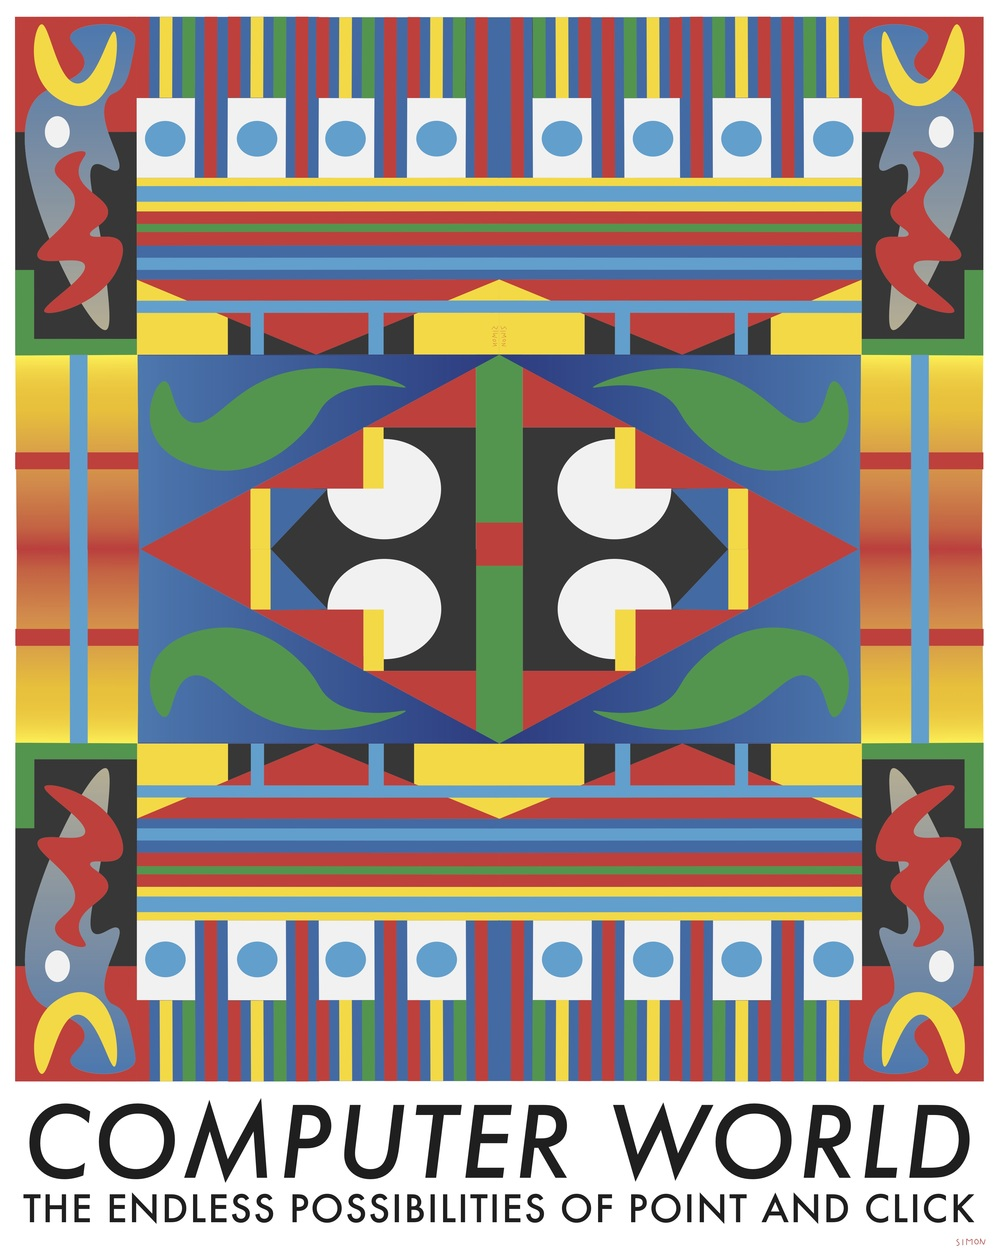 Computer World 2016.jpg